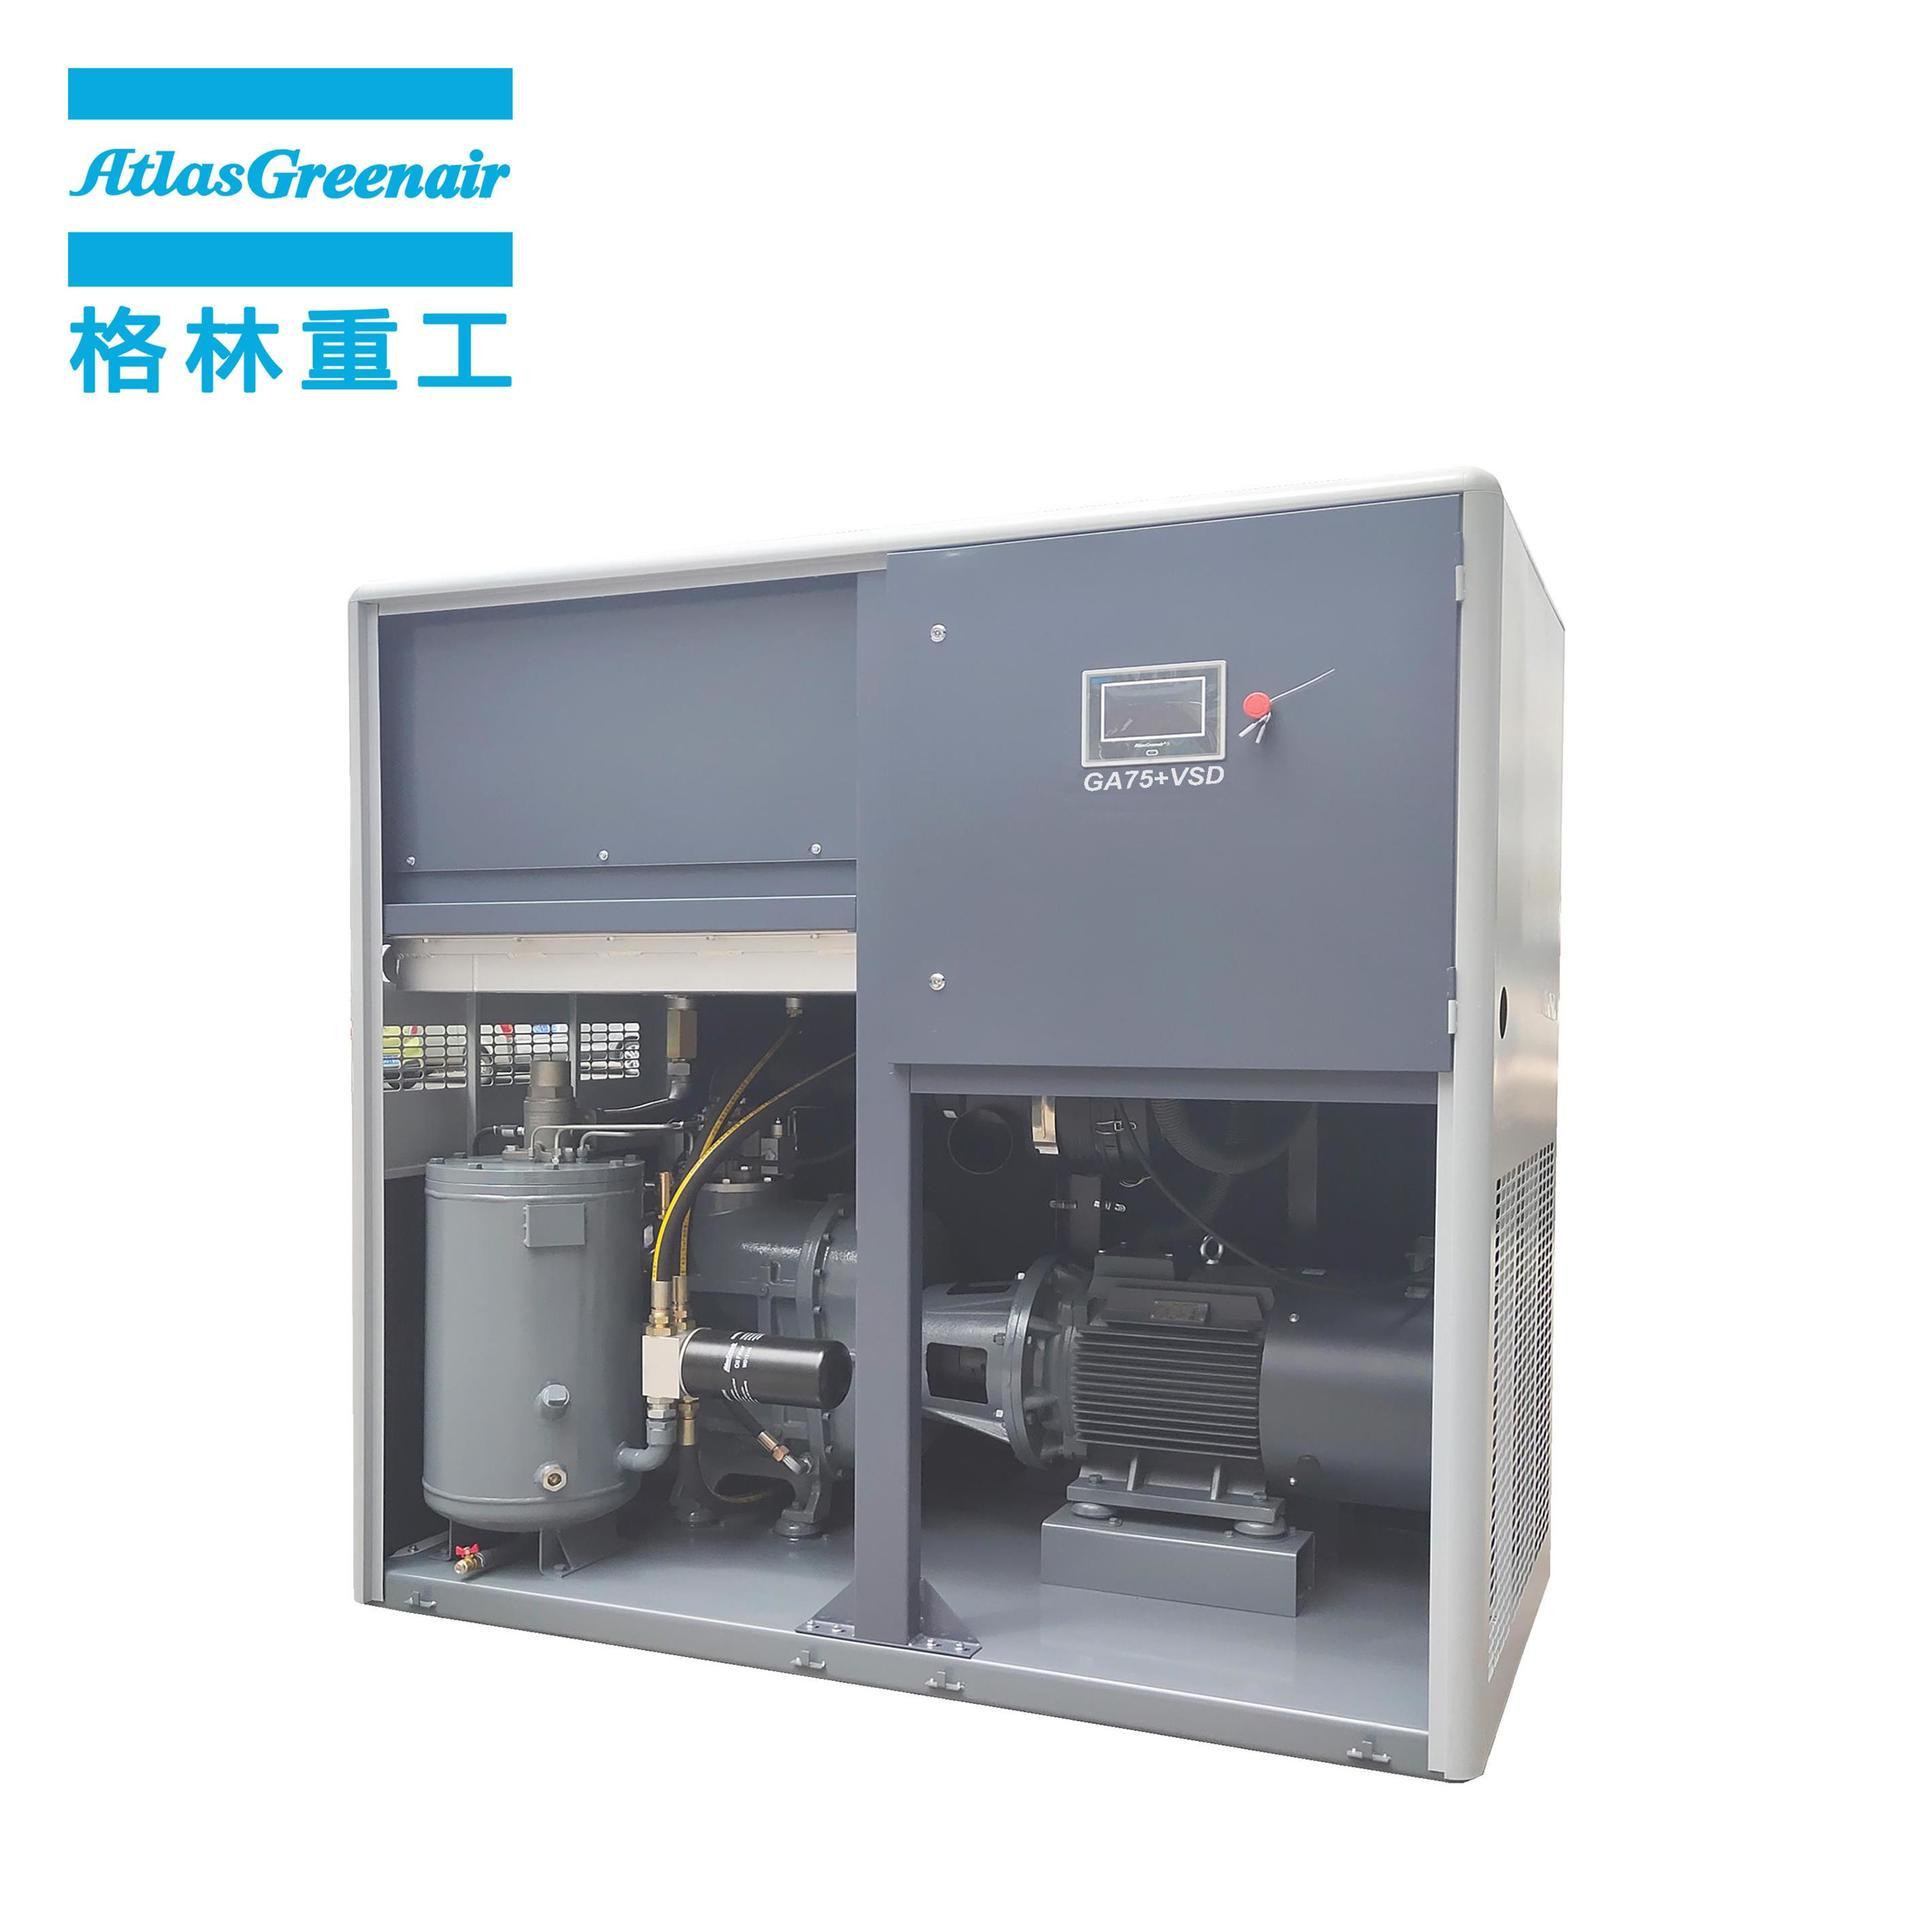 Atlas Greenair GA75+VSD 75kW Two Stage Variable Speed Energy Saving Screw Type Air Compressor